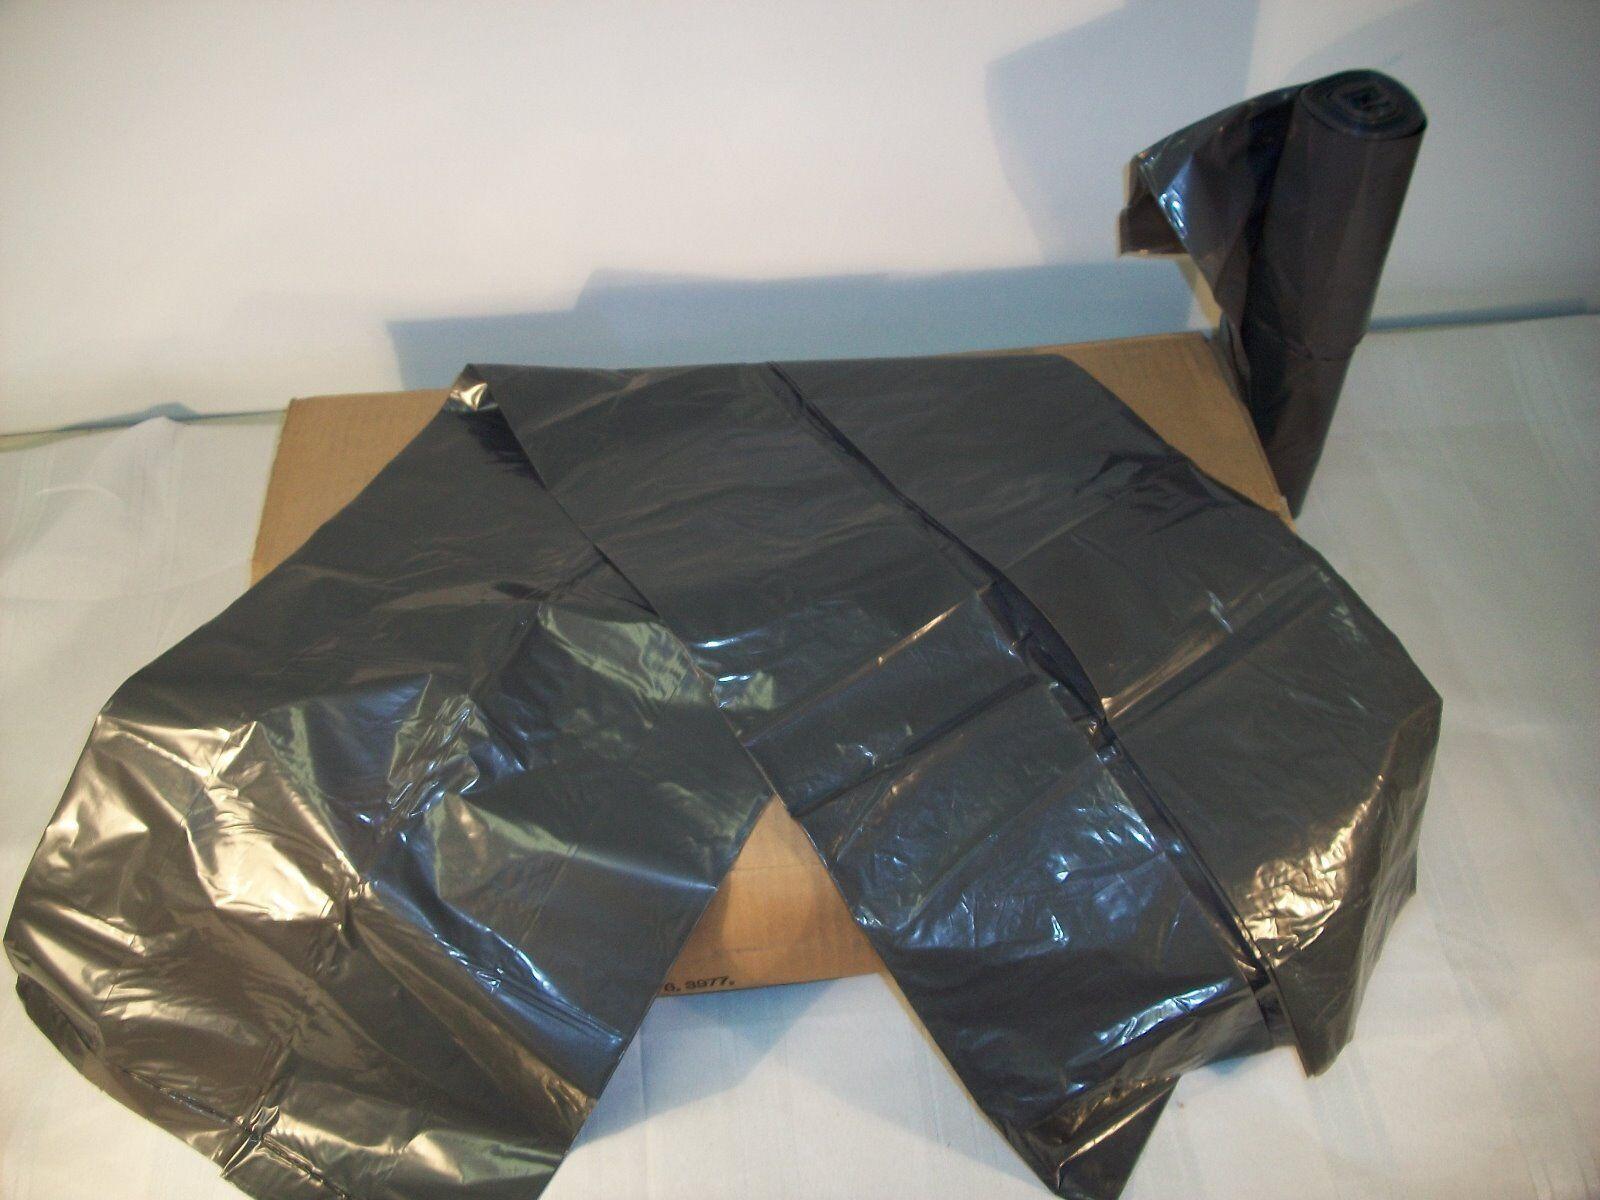 1 ROLL 25 EA BAGS RUBBERMAID 5007-88 HEAVY DUTY POLYLINER TRASH BAG 32 GALLON